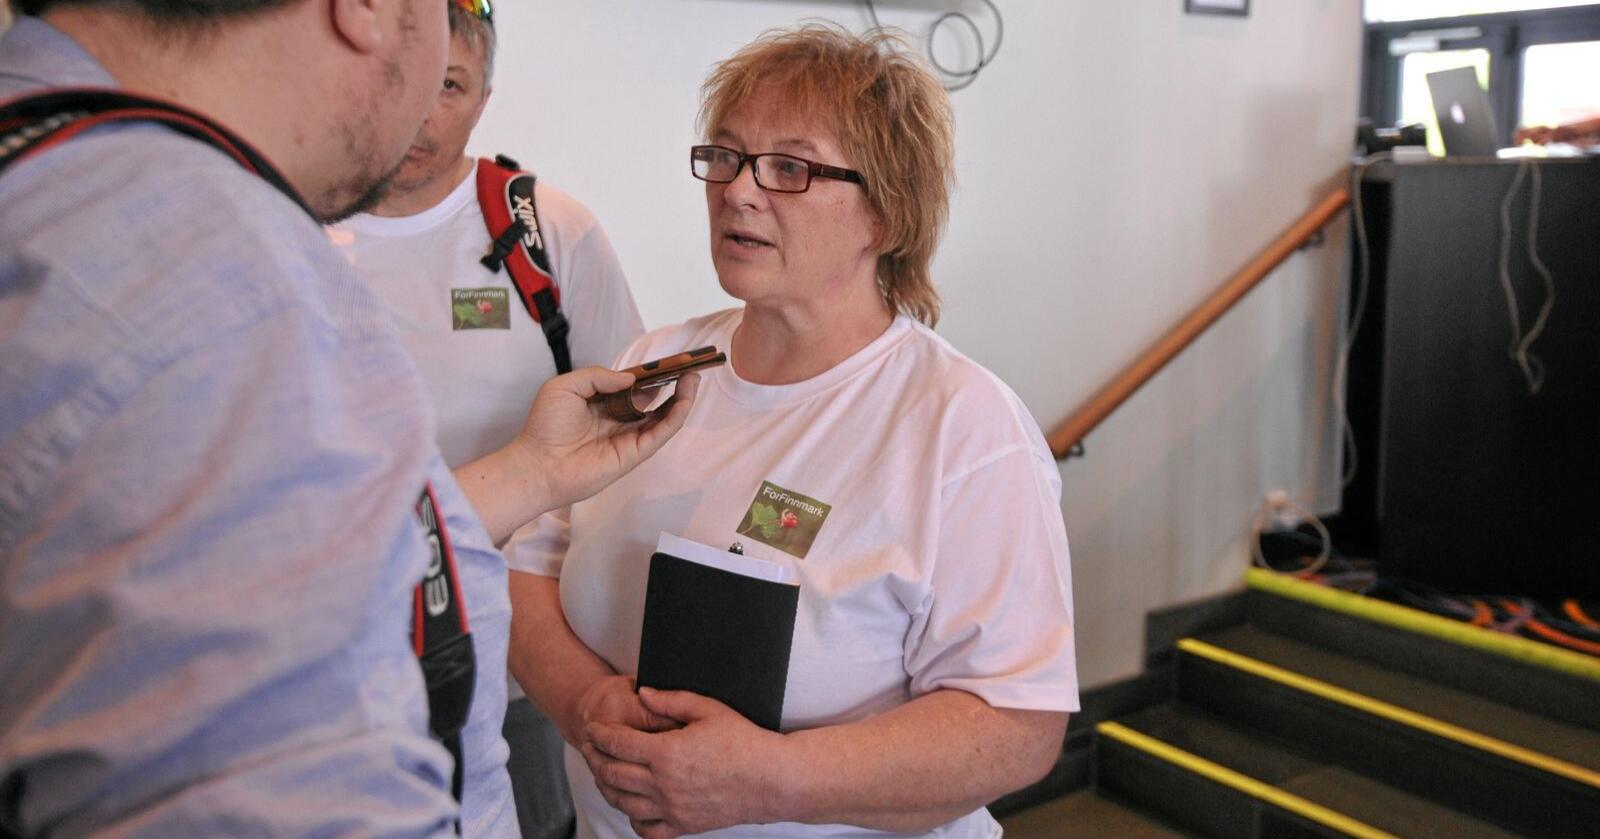 Tidligere stortingspolitiker Randi Karlstrøm har meldt seg inn i Senterpartiet. Foto: Sivert Rossing